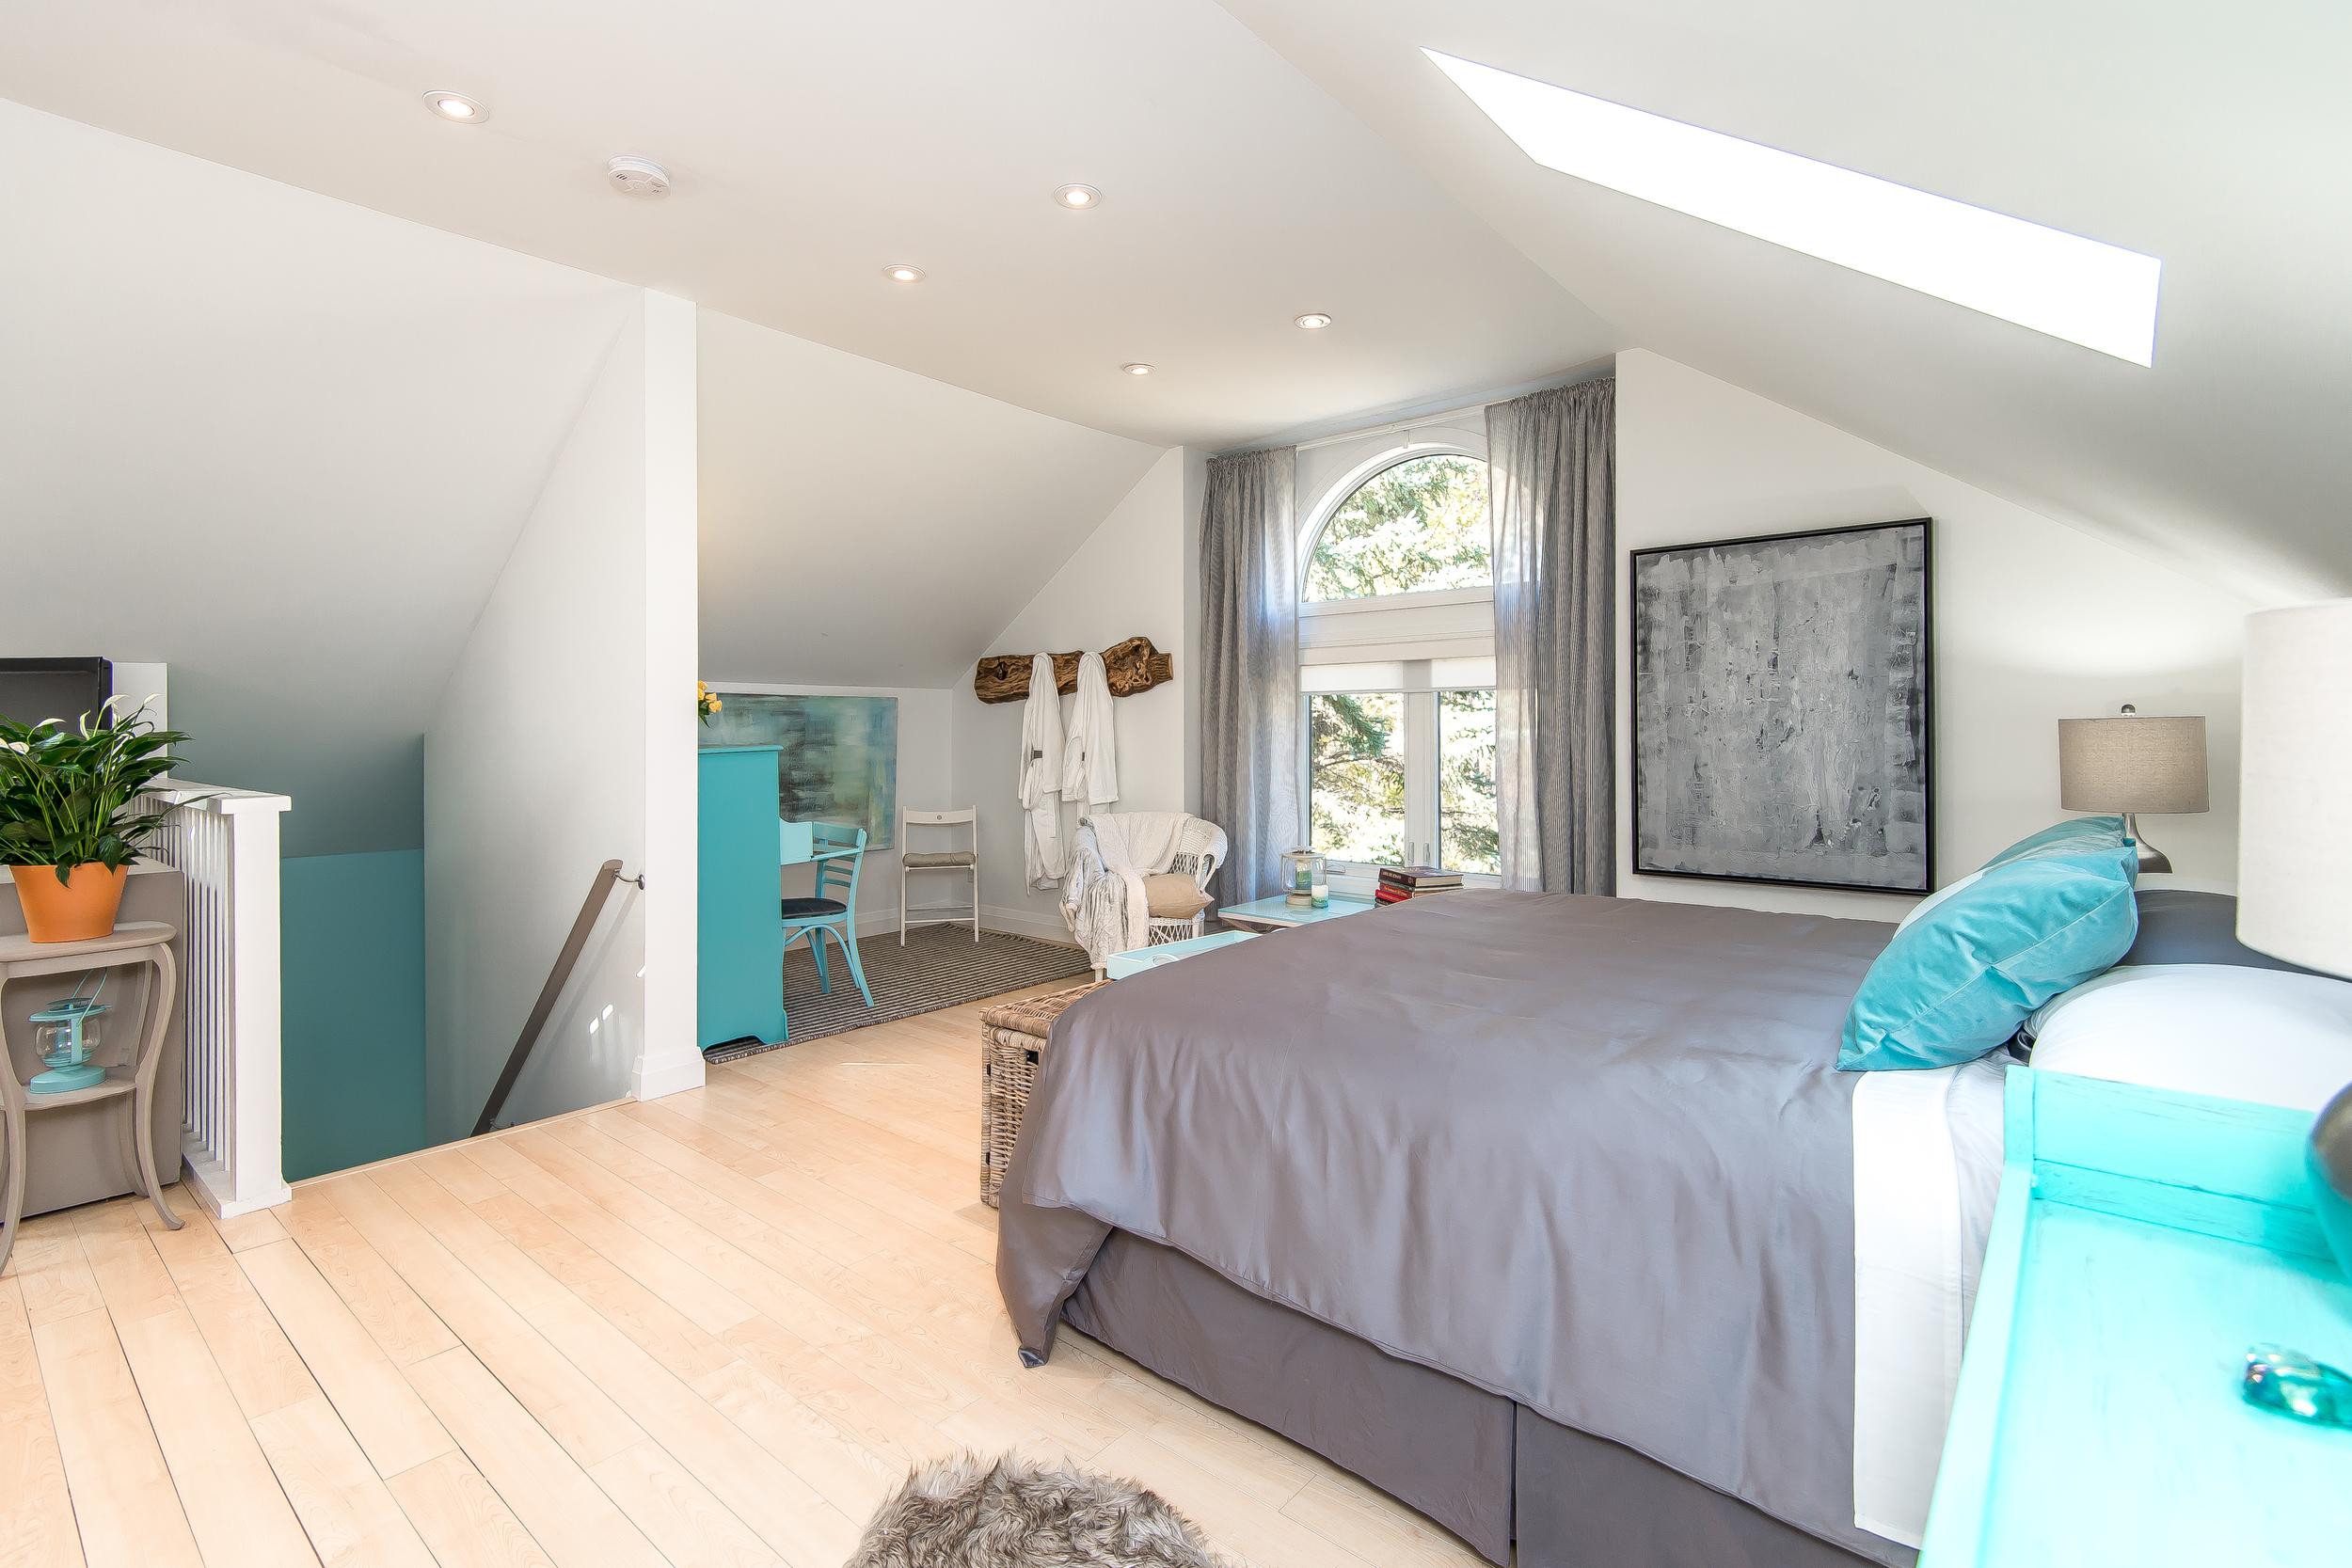 View of bedroom area